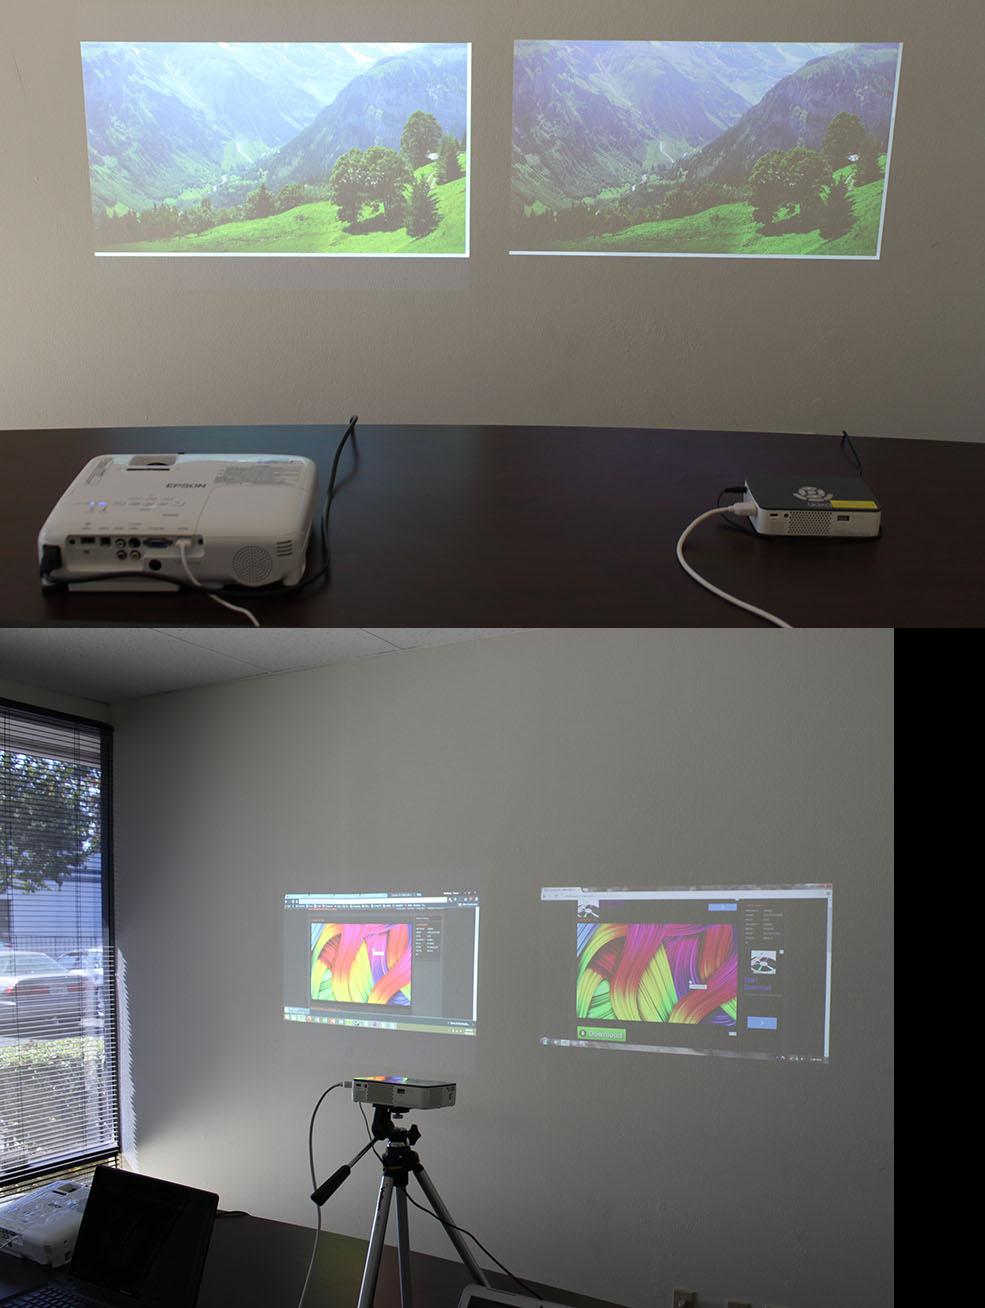 AAXA P450 Pico Projector  DLP Handheld Mini Projector